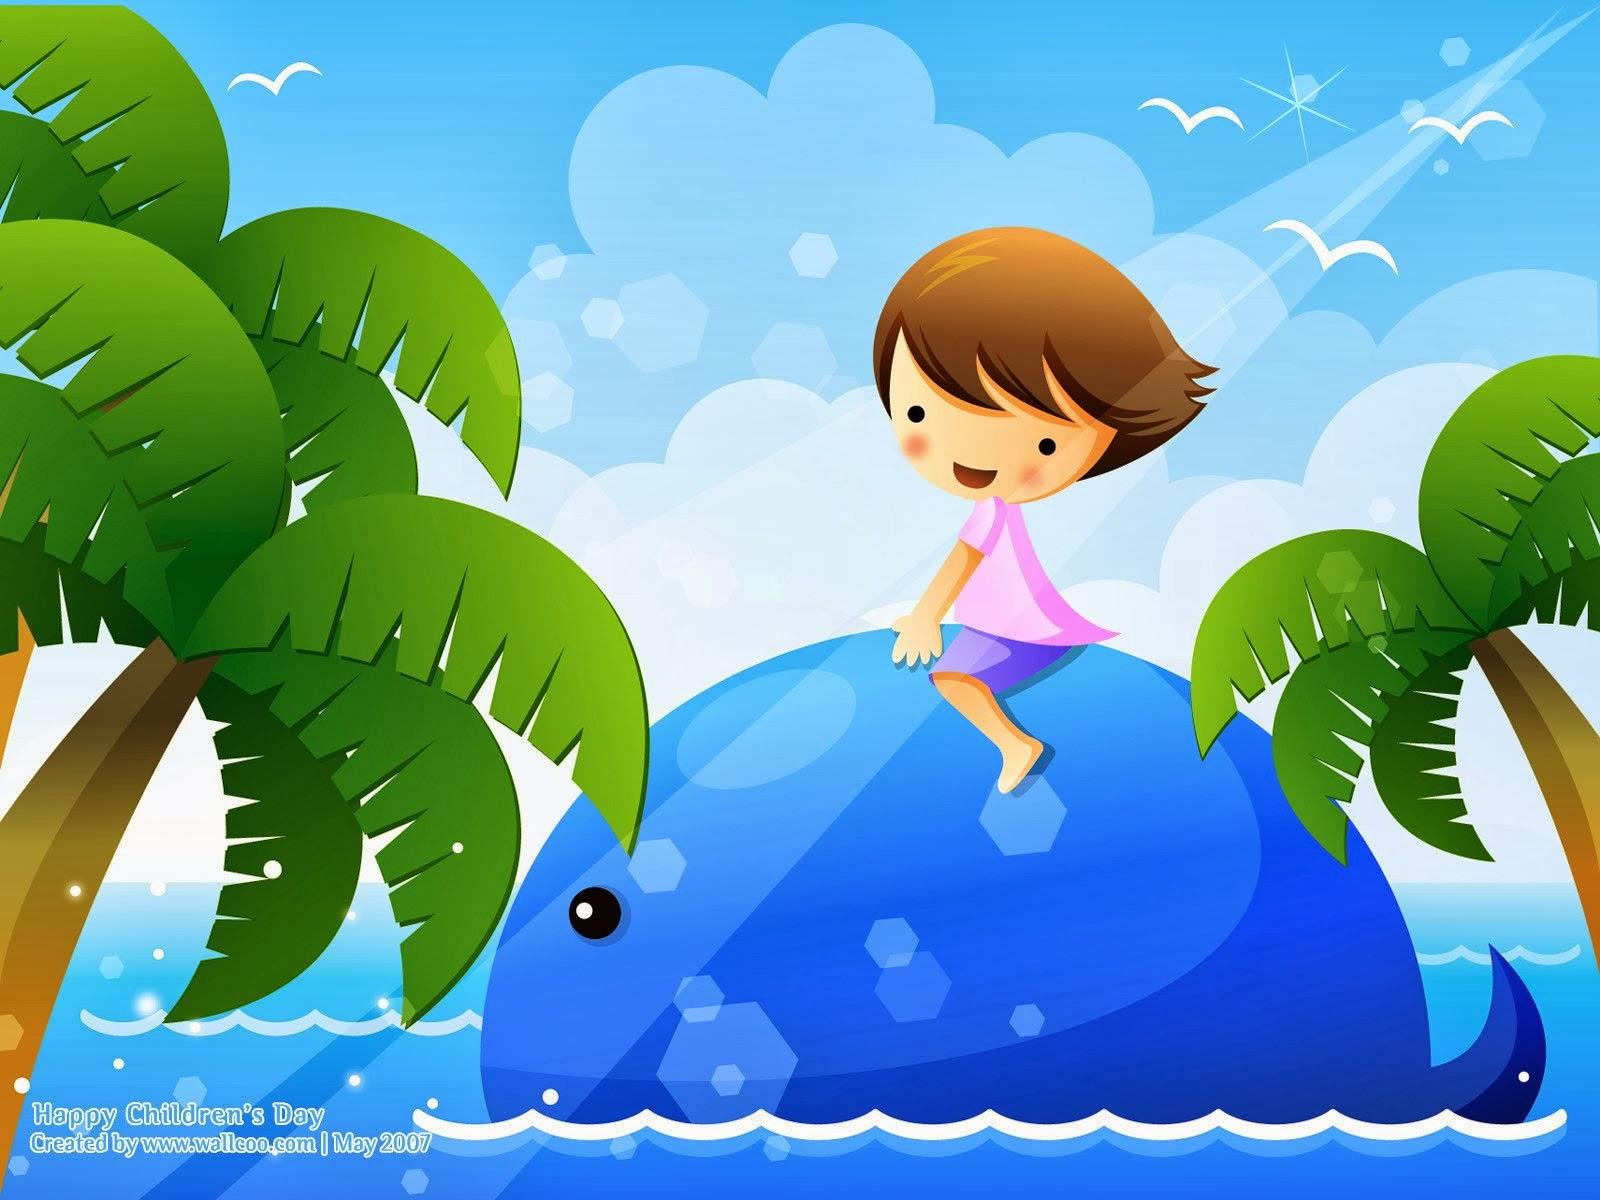 kids wallpaper children game in high resolution for get cute kids 1600x1200